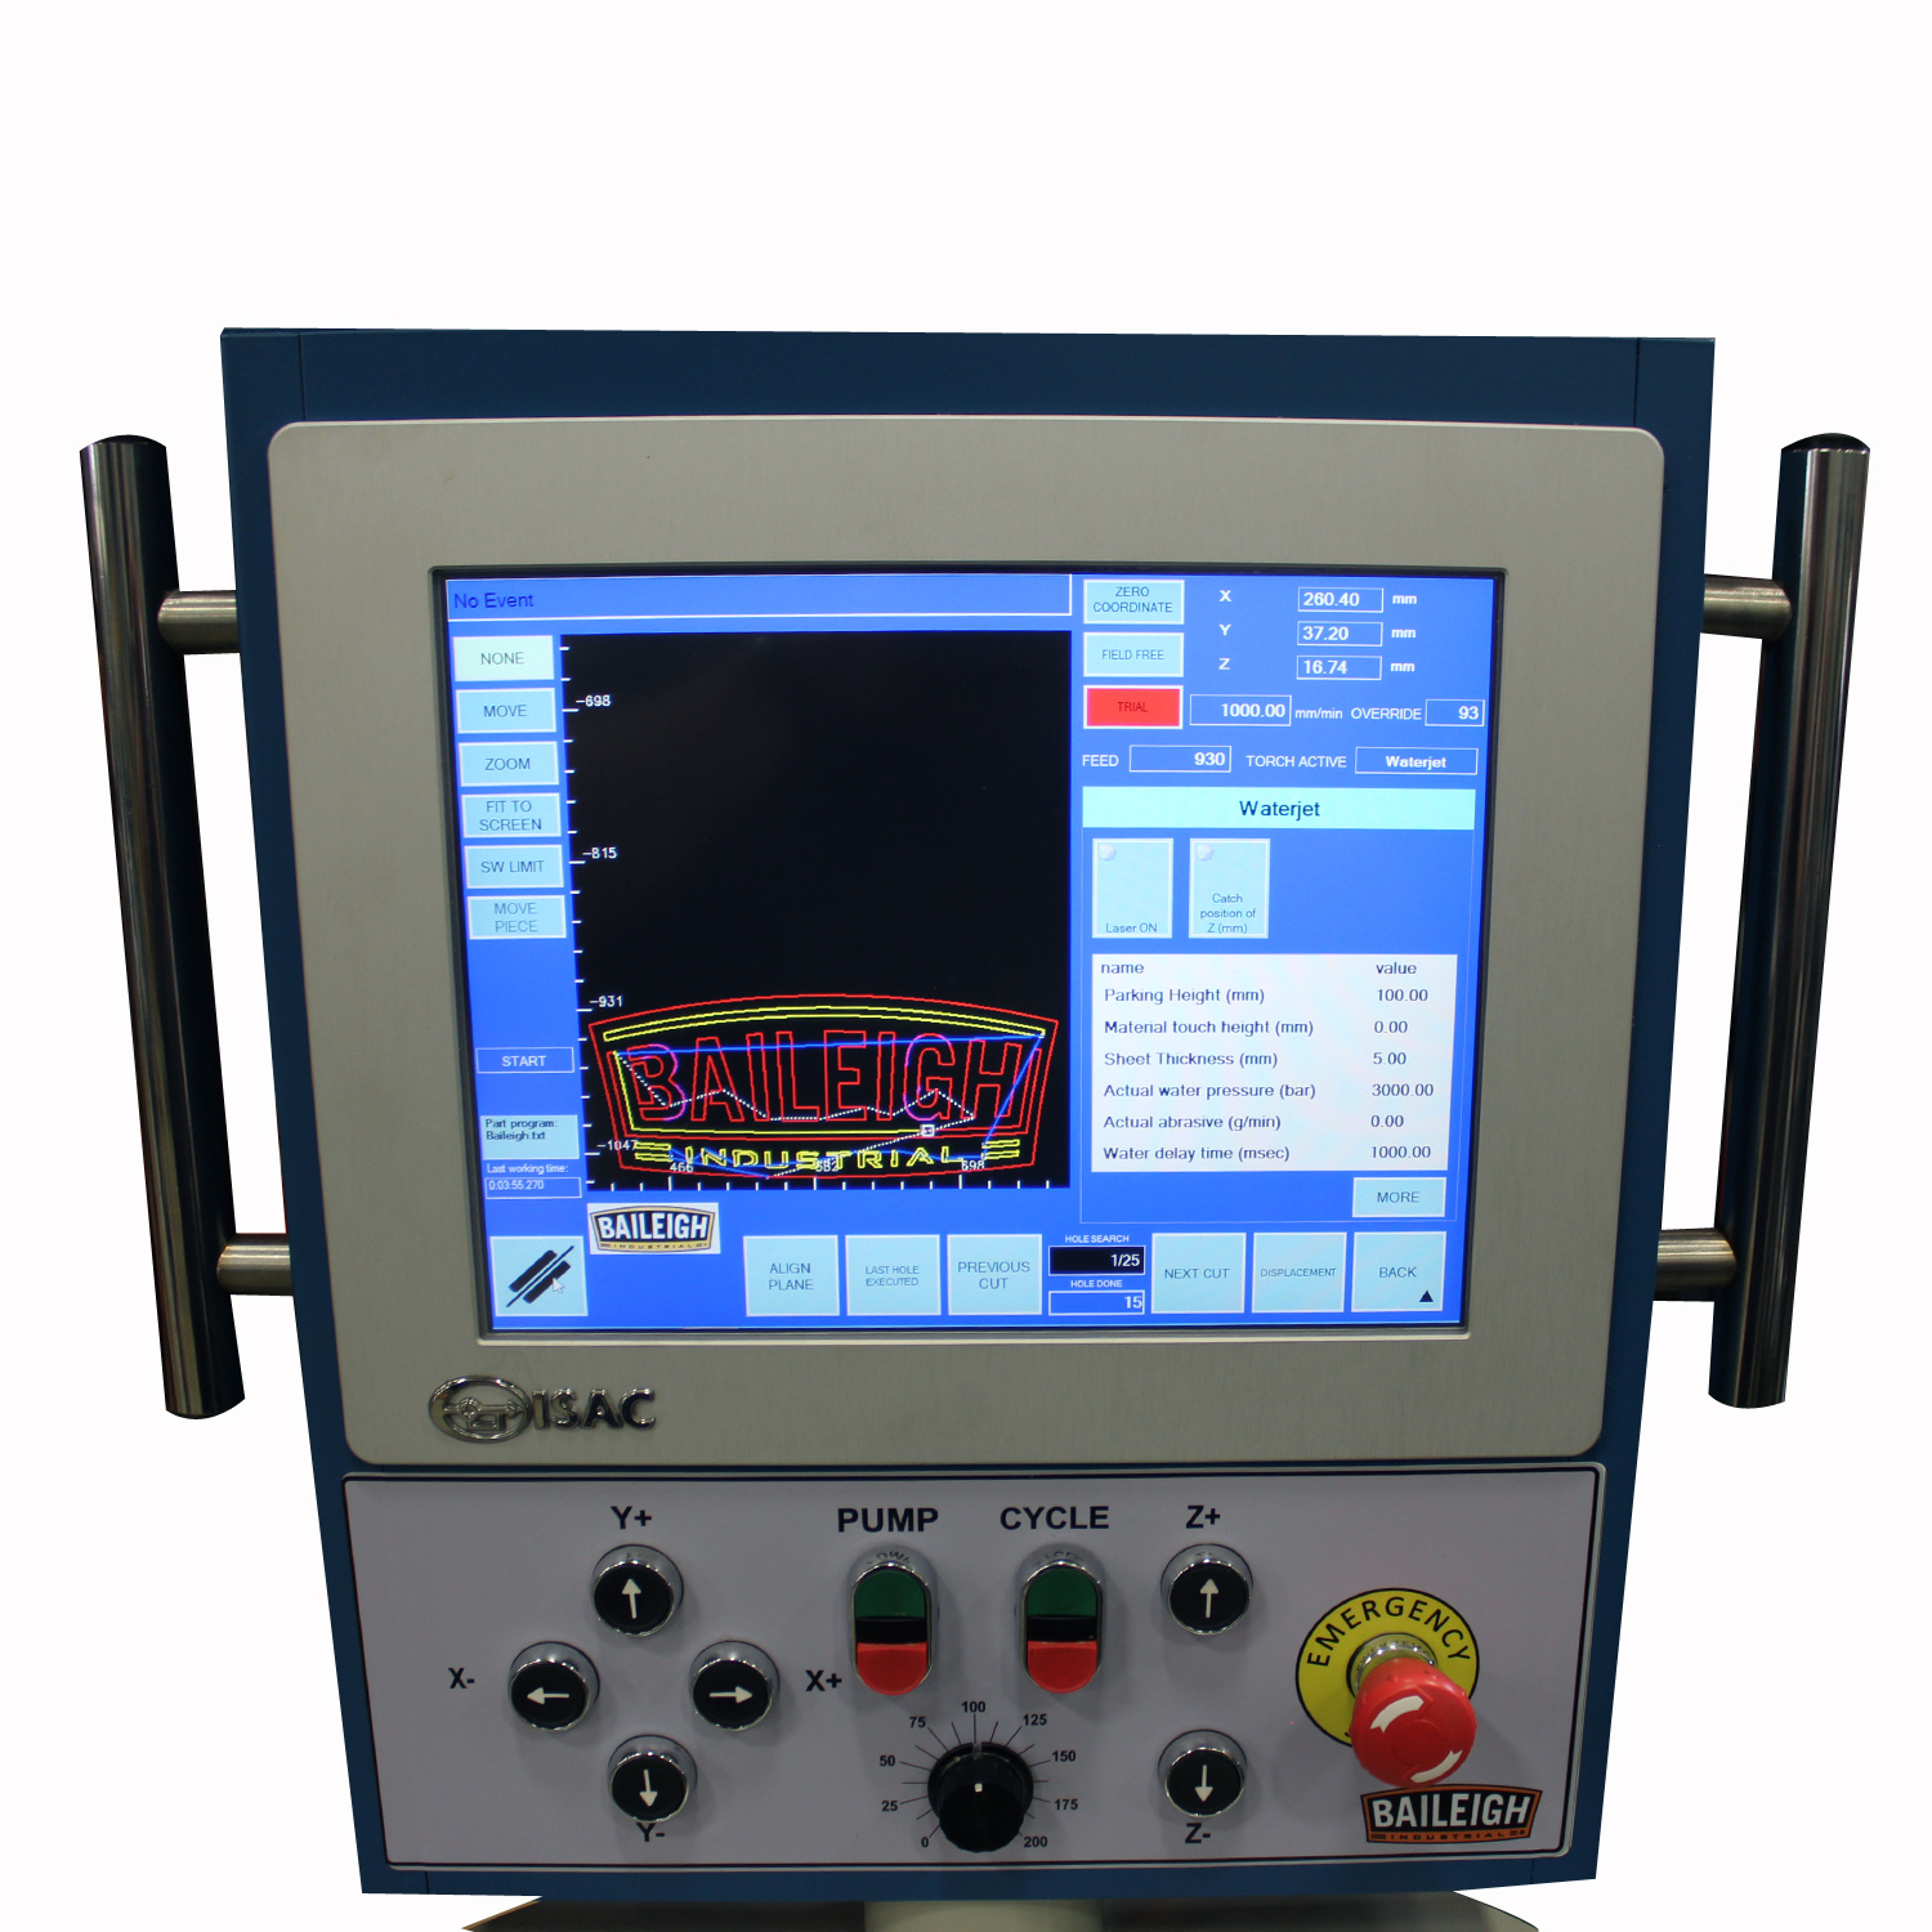 water jet wj 44cnc baileigh industrial baileigh industrial direct drive pump touchscreen